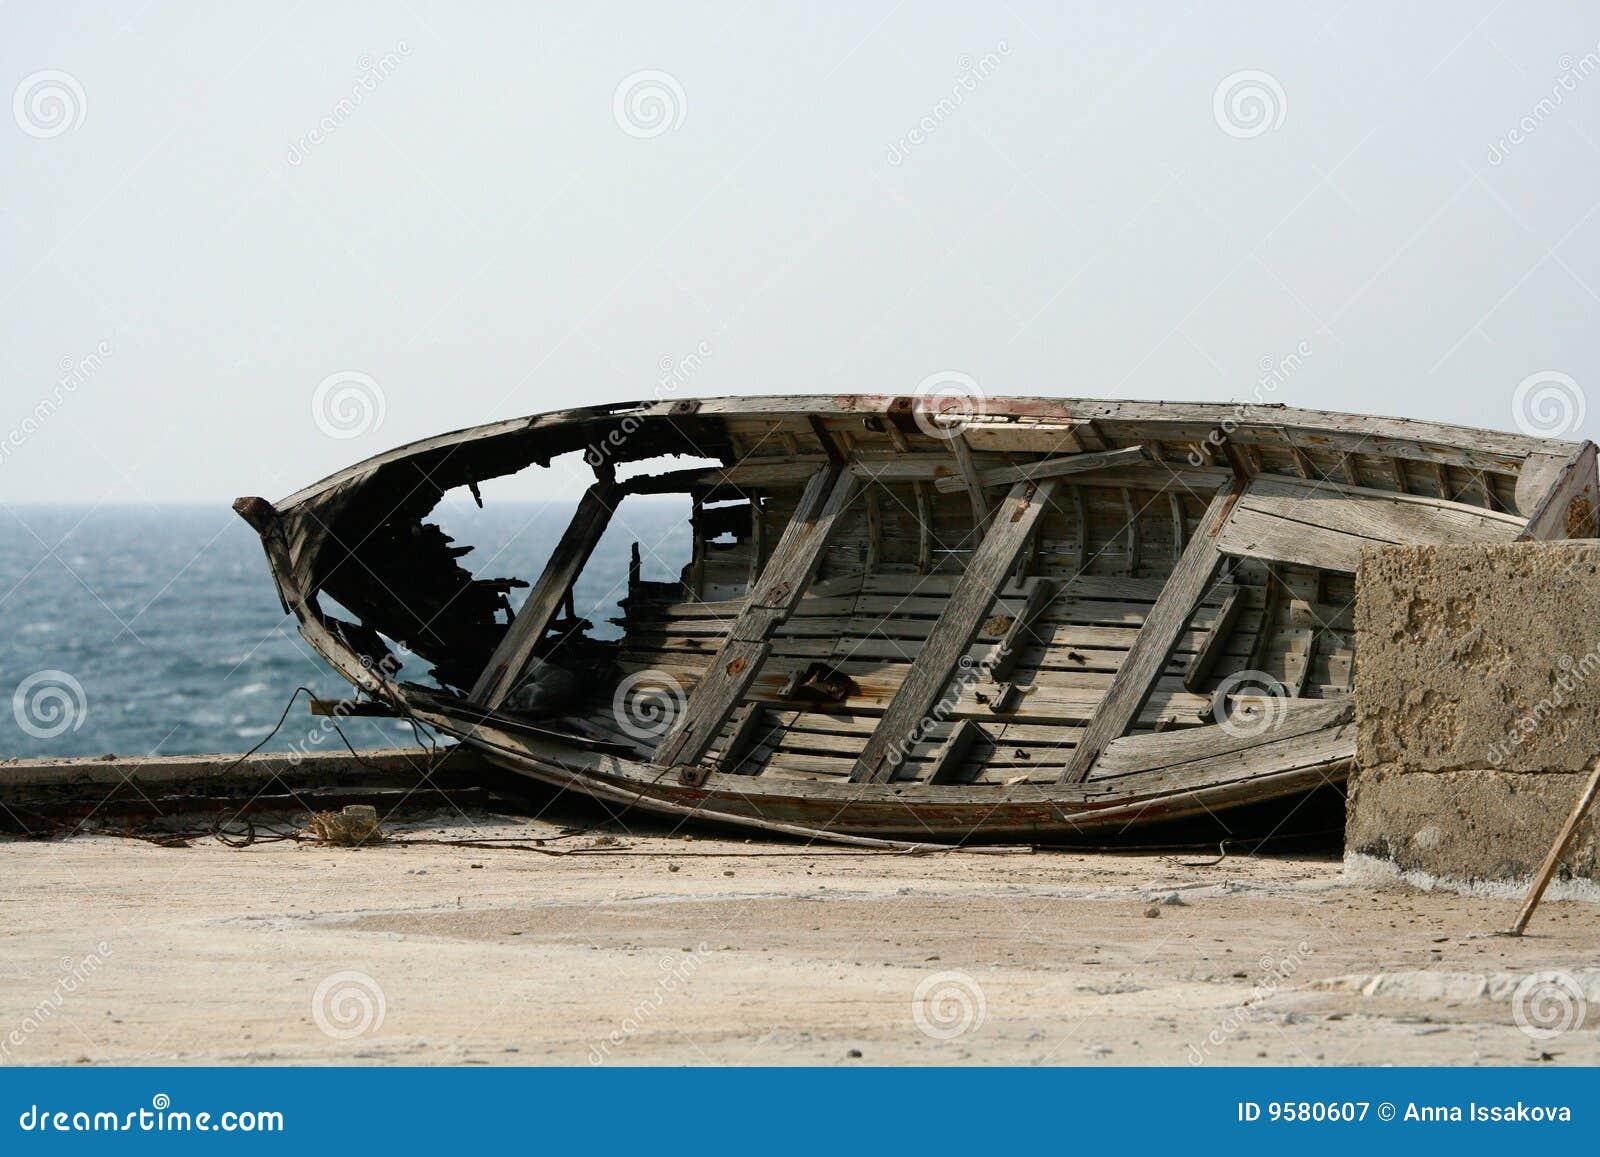 Broken Boat Royalty Free Stock Photography - Image: 9580607